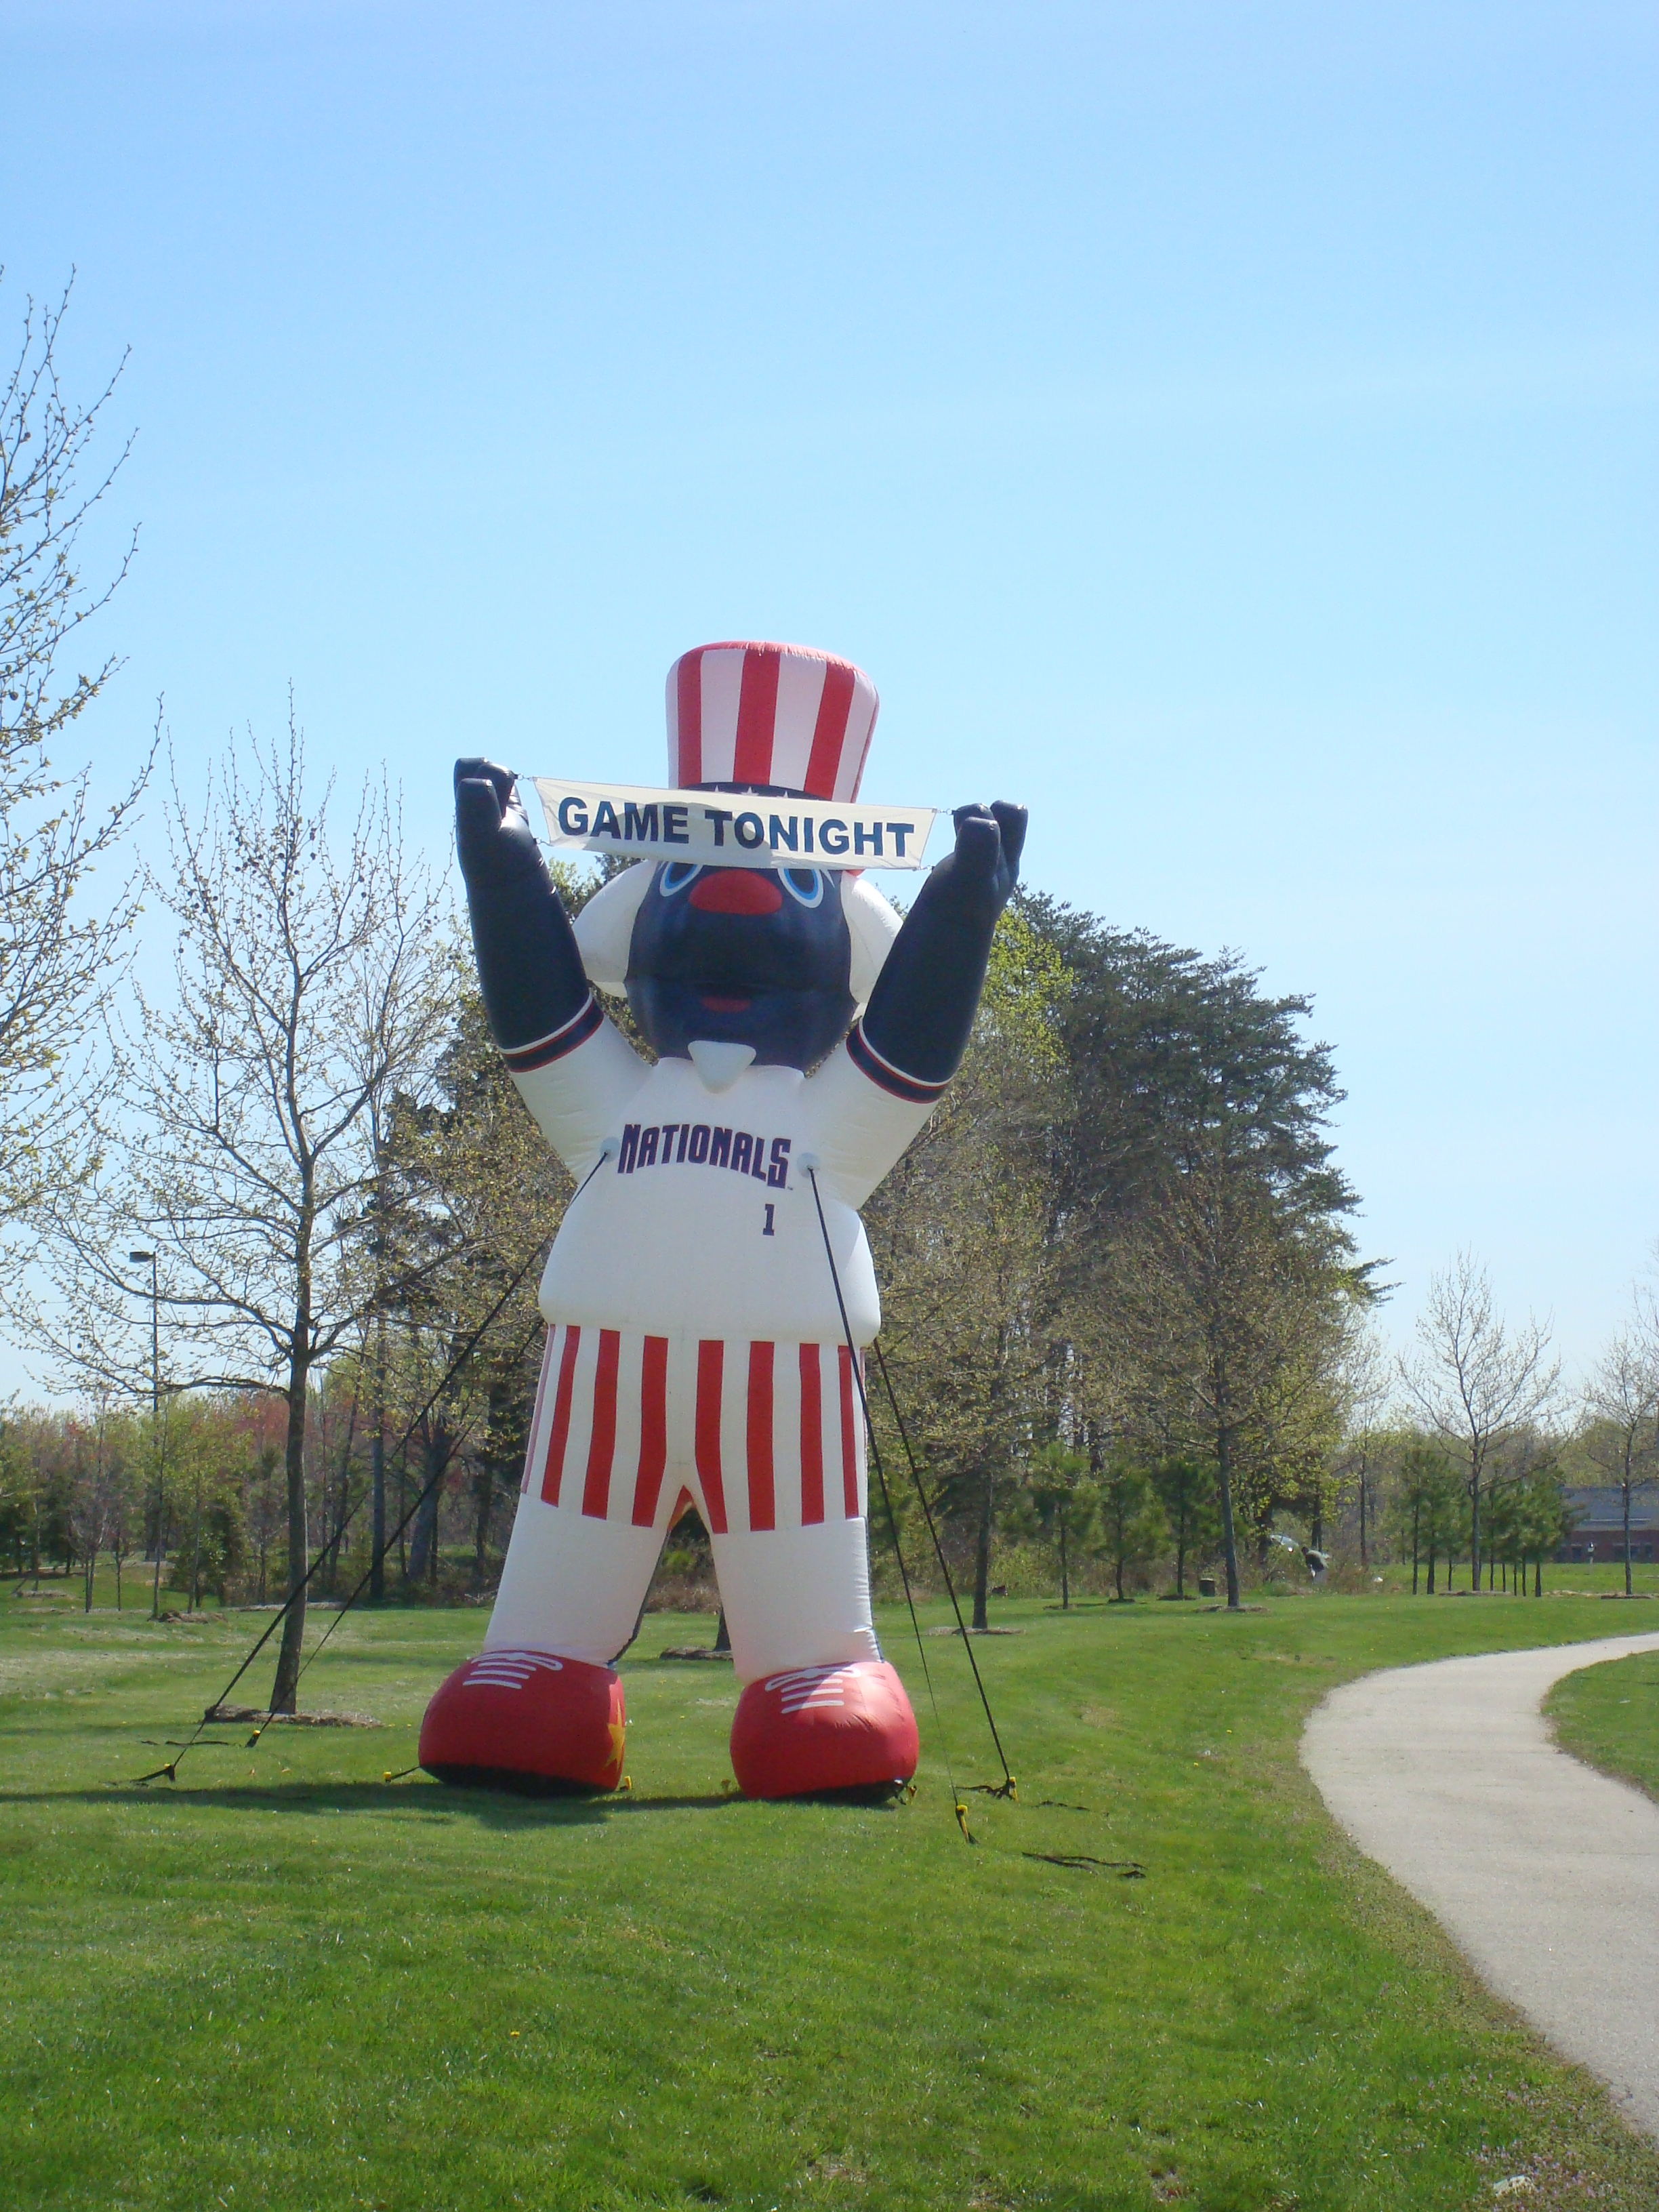 Patomic Nationals Mascot